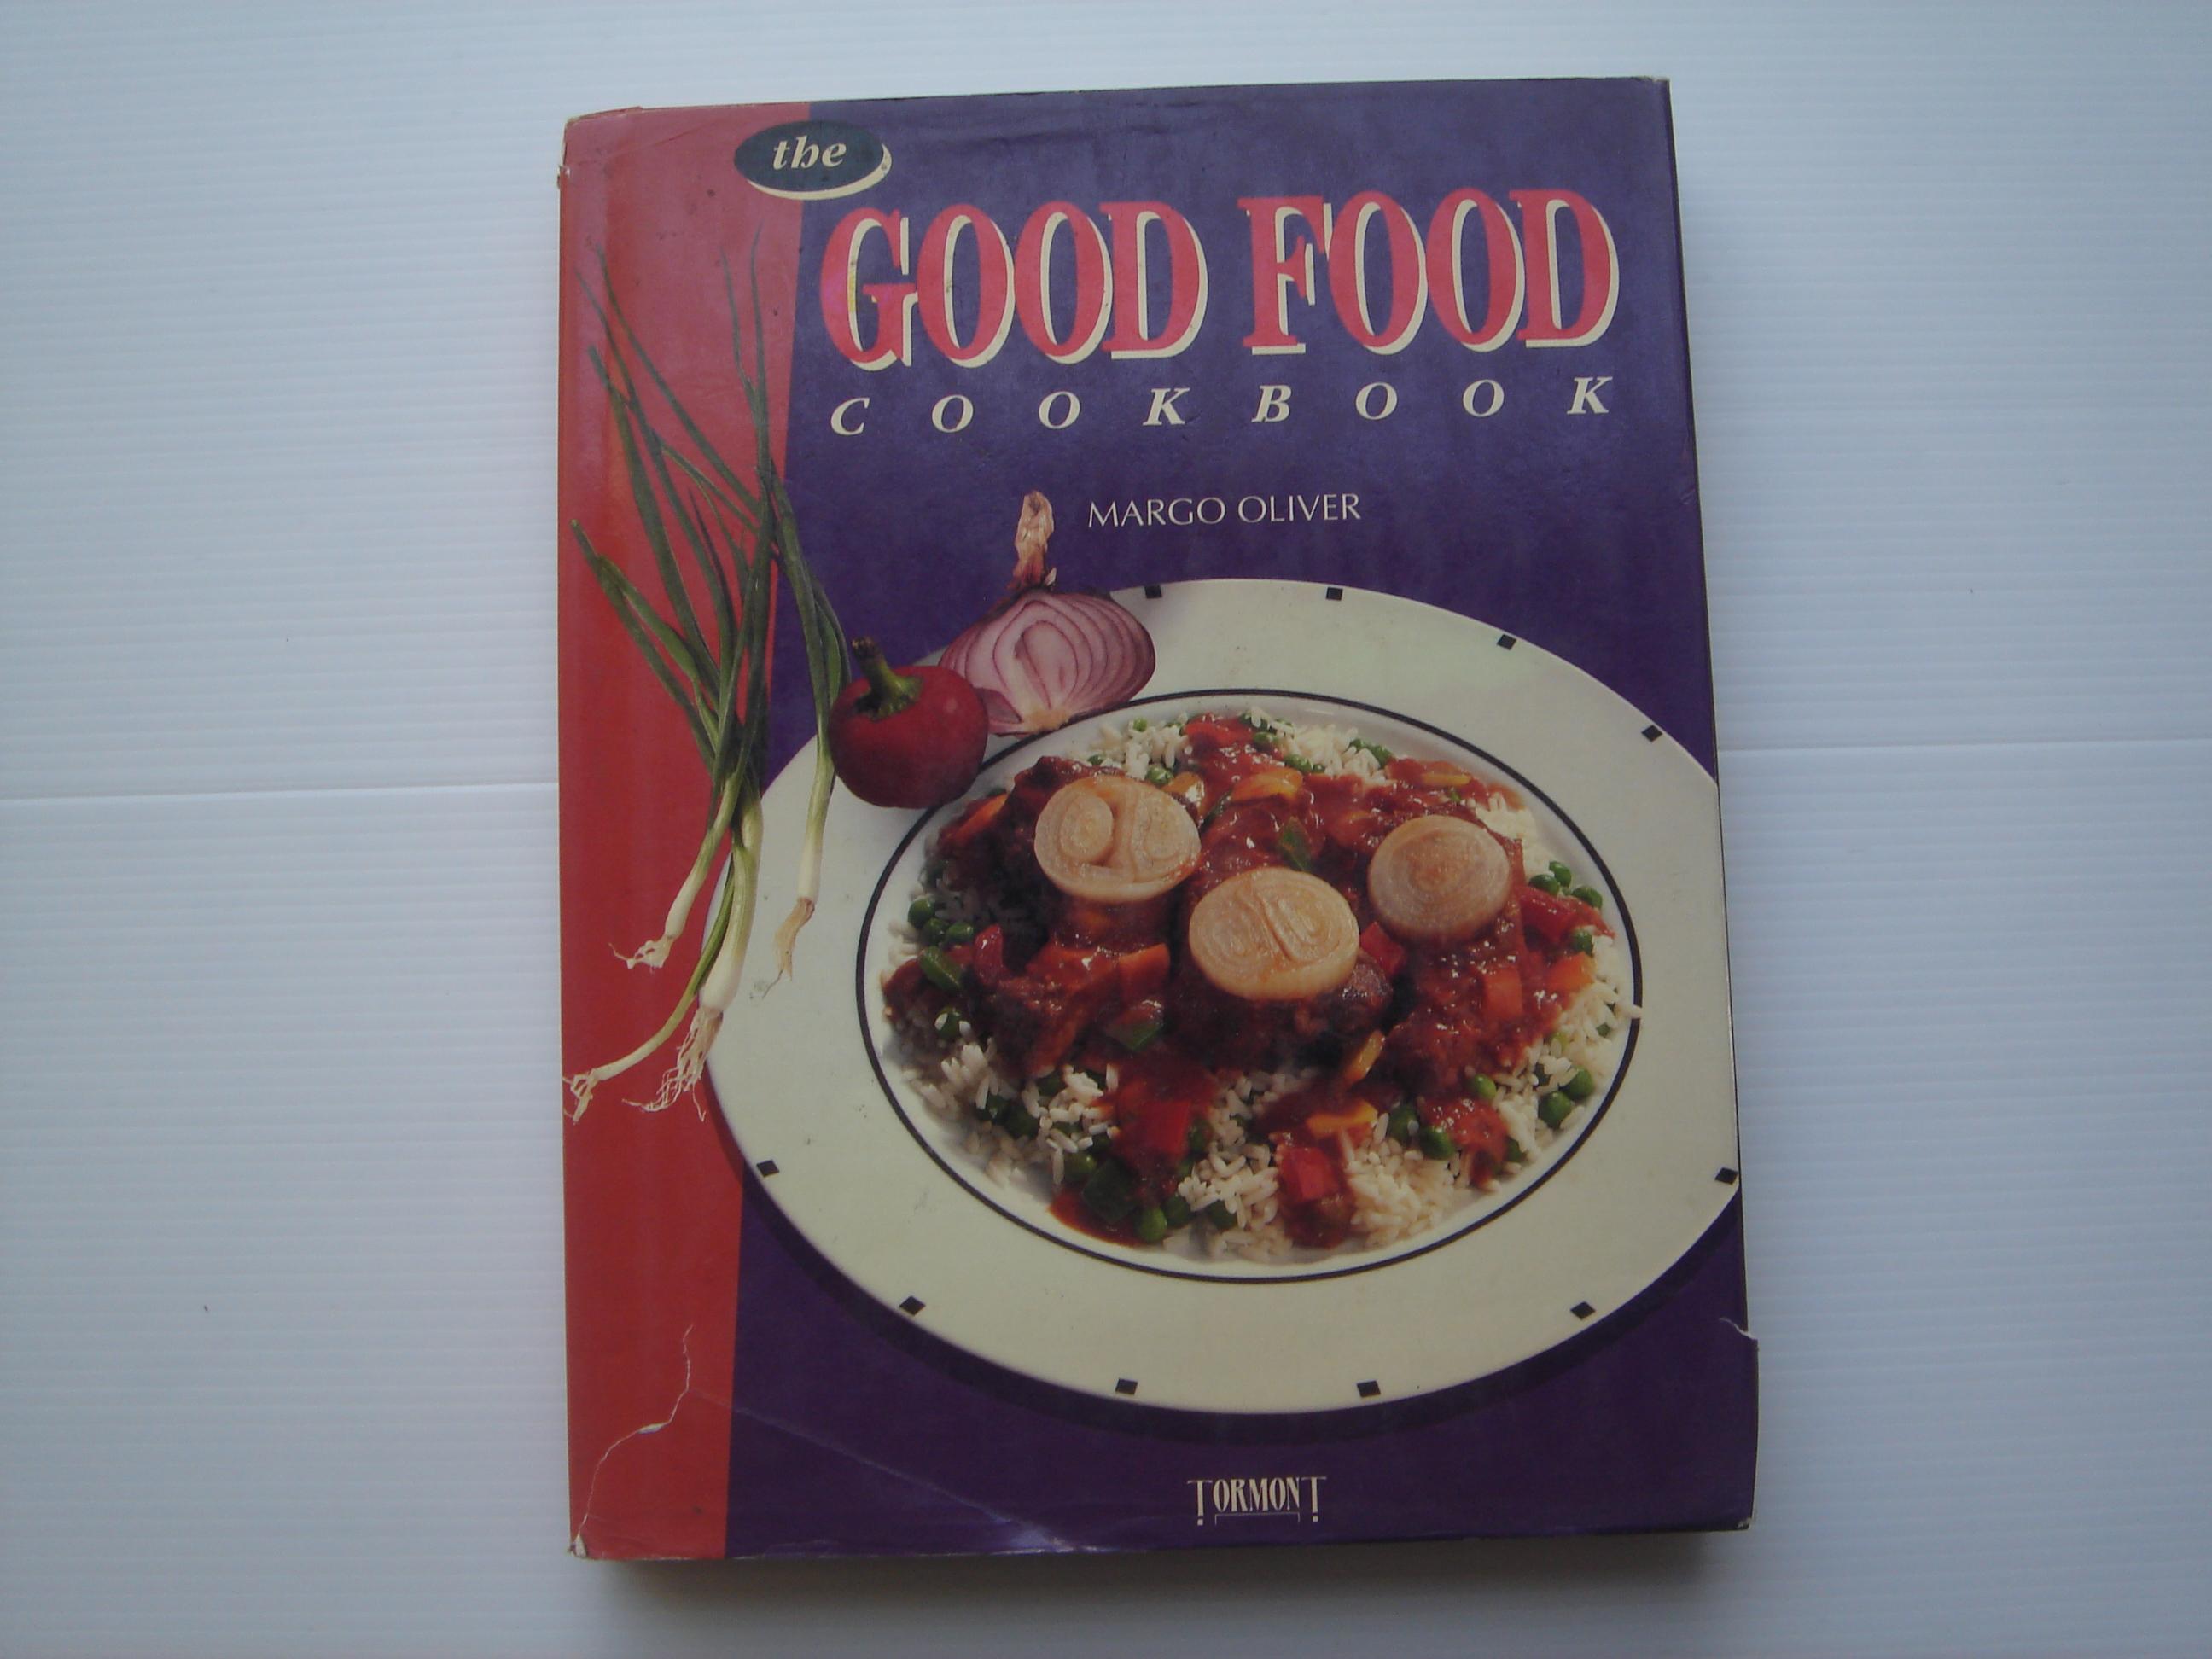 The Good Food Cook Book (ฉบับภาษาอังกฤษ)